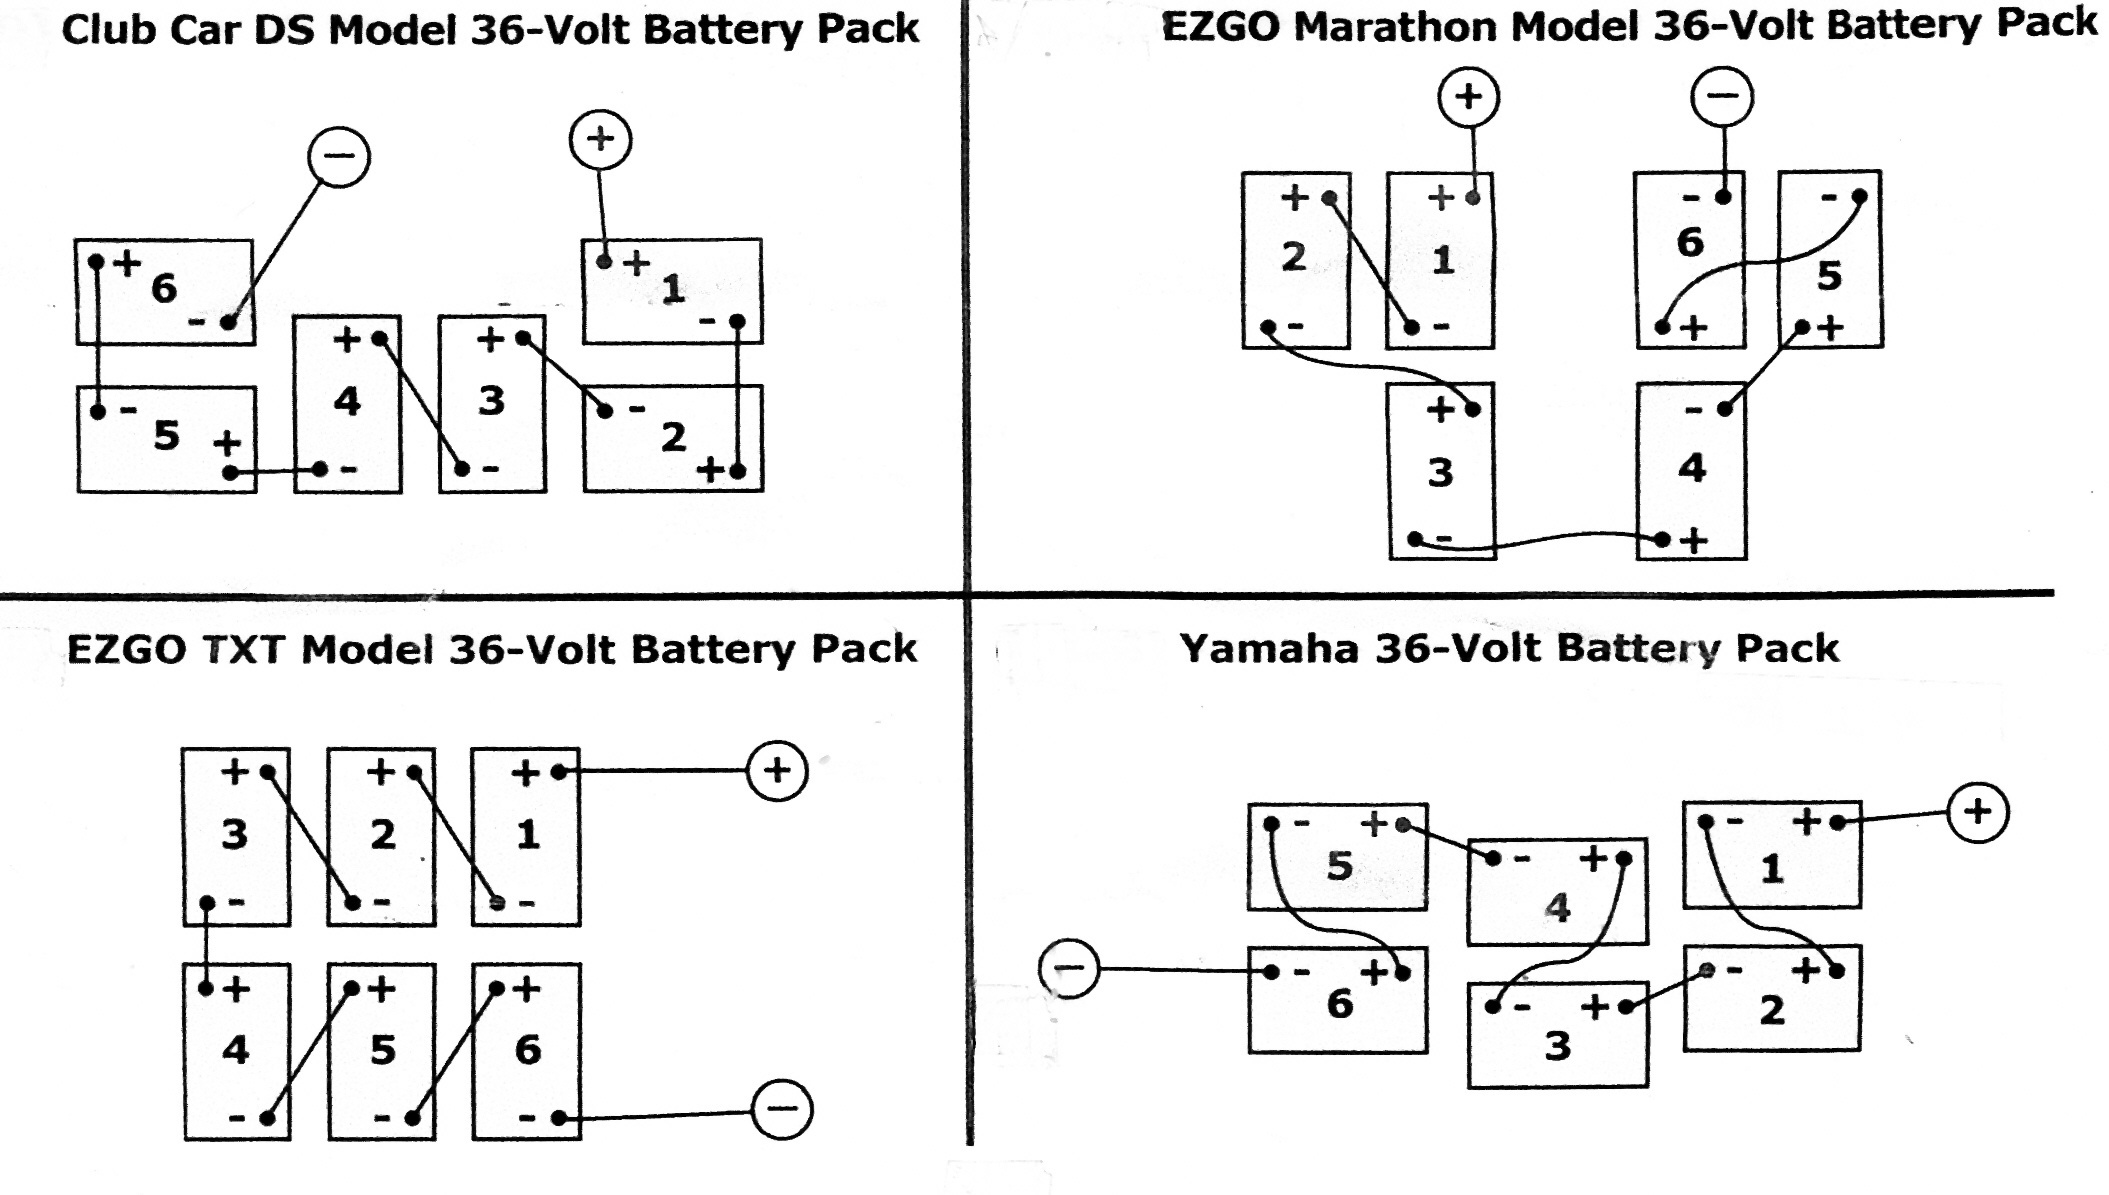 Diagram 36 Volt Club Car Wiring Diagram Charge Indicators Full Version Hd Quality Charge Indicators Diagramalsupy Martapierobon It